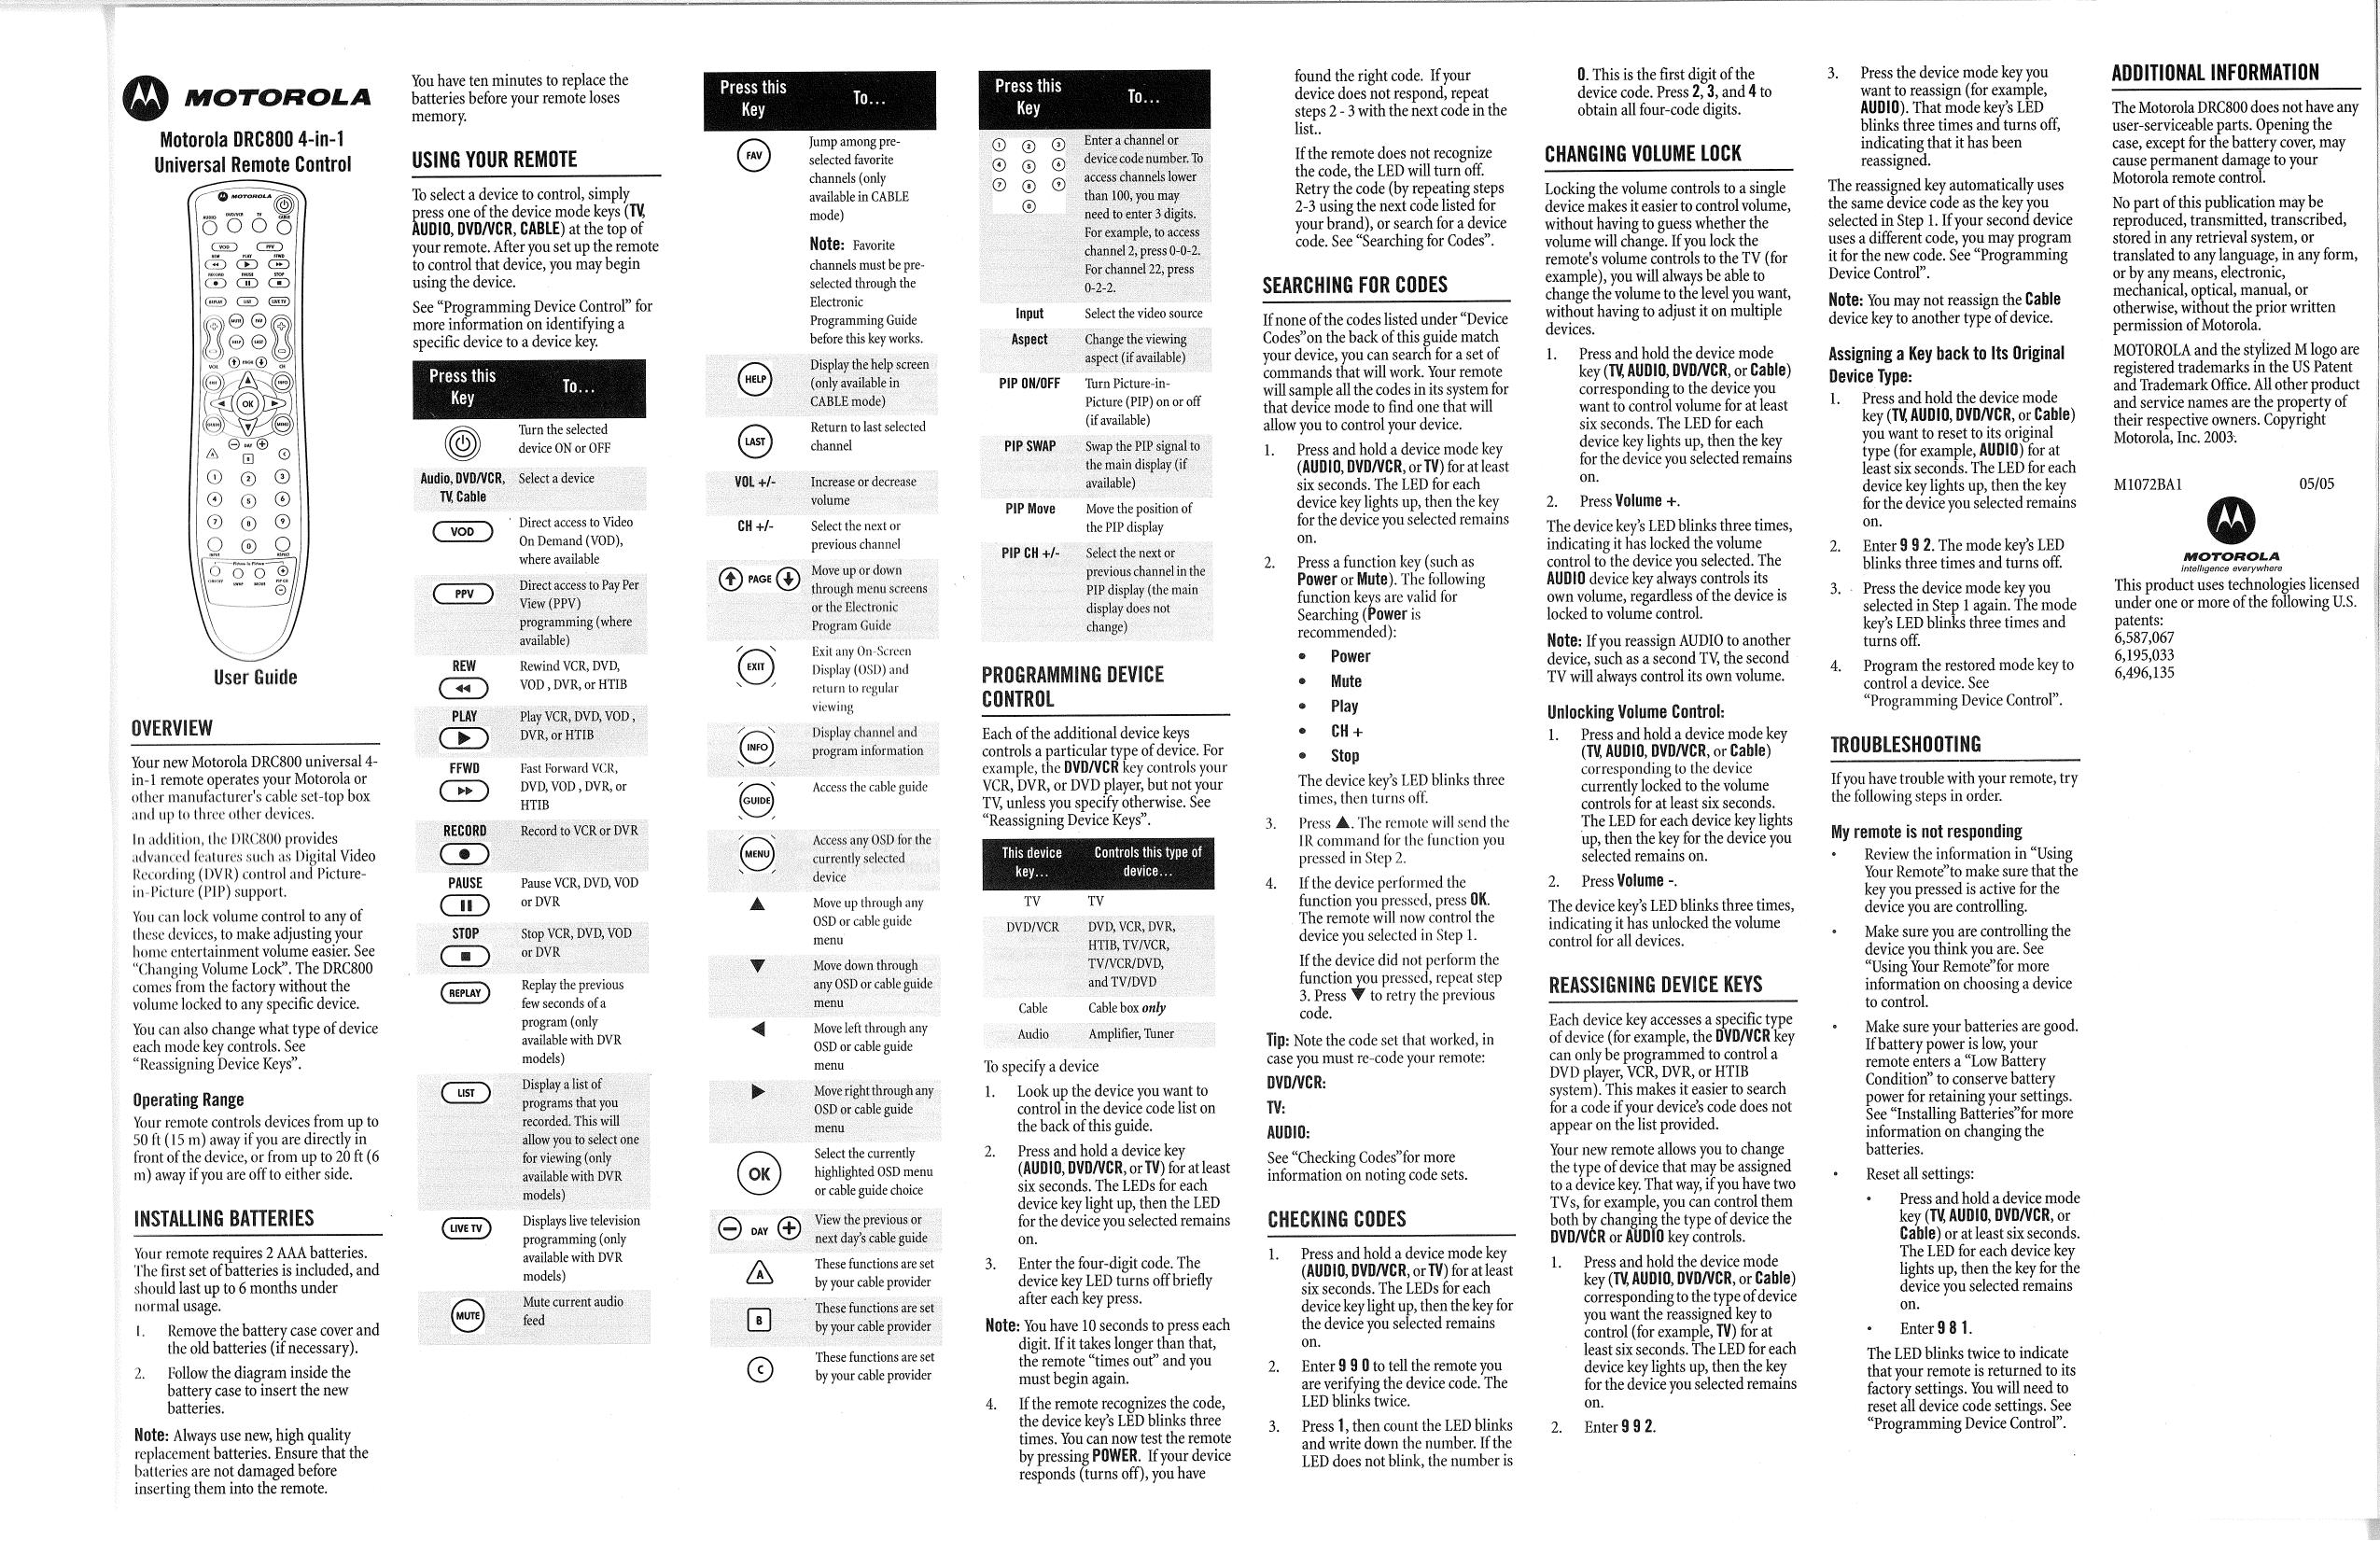 Motorola dcr800 remote control manual